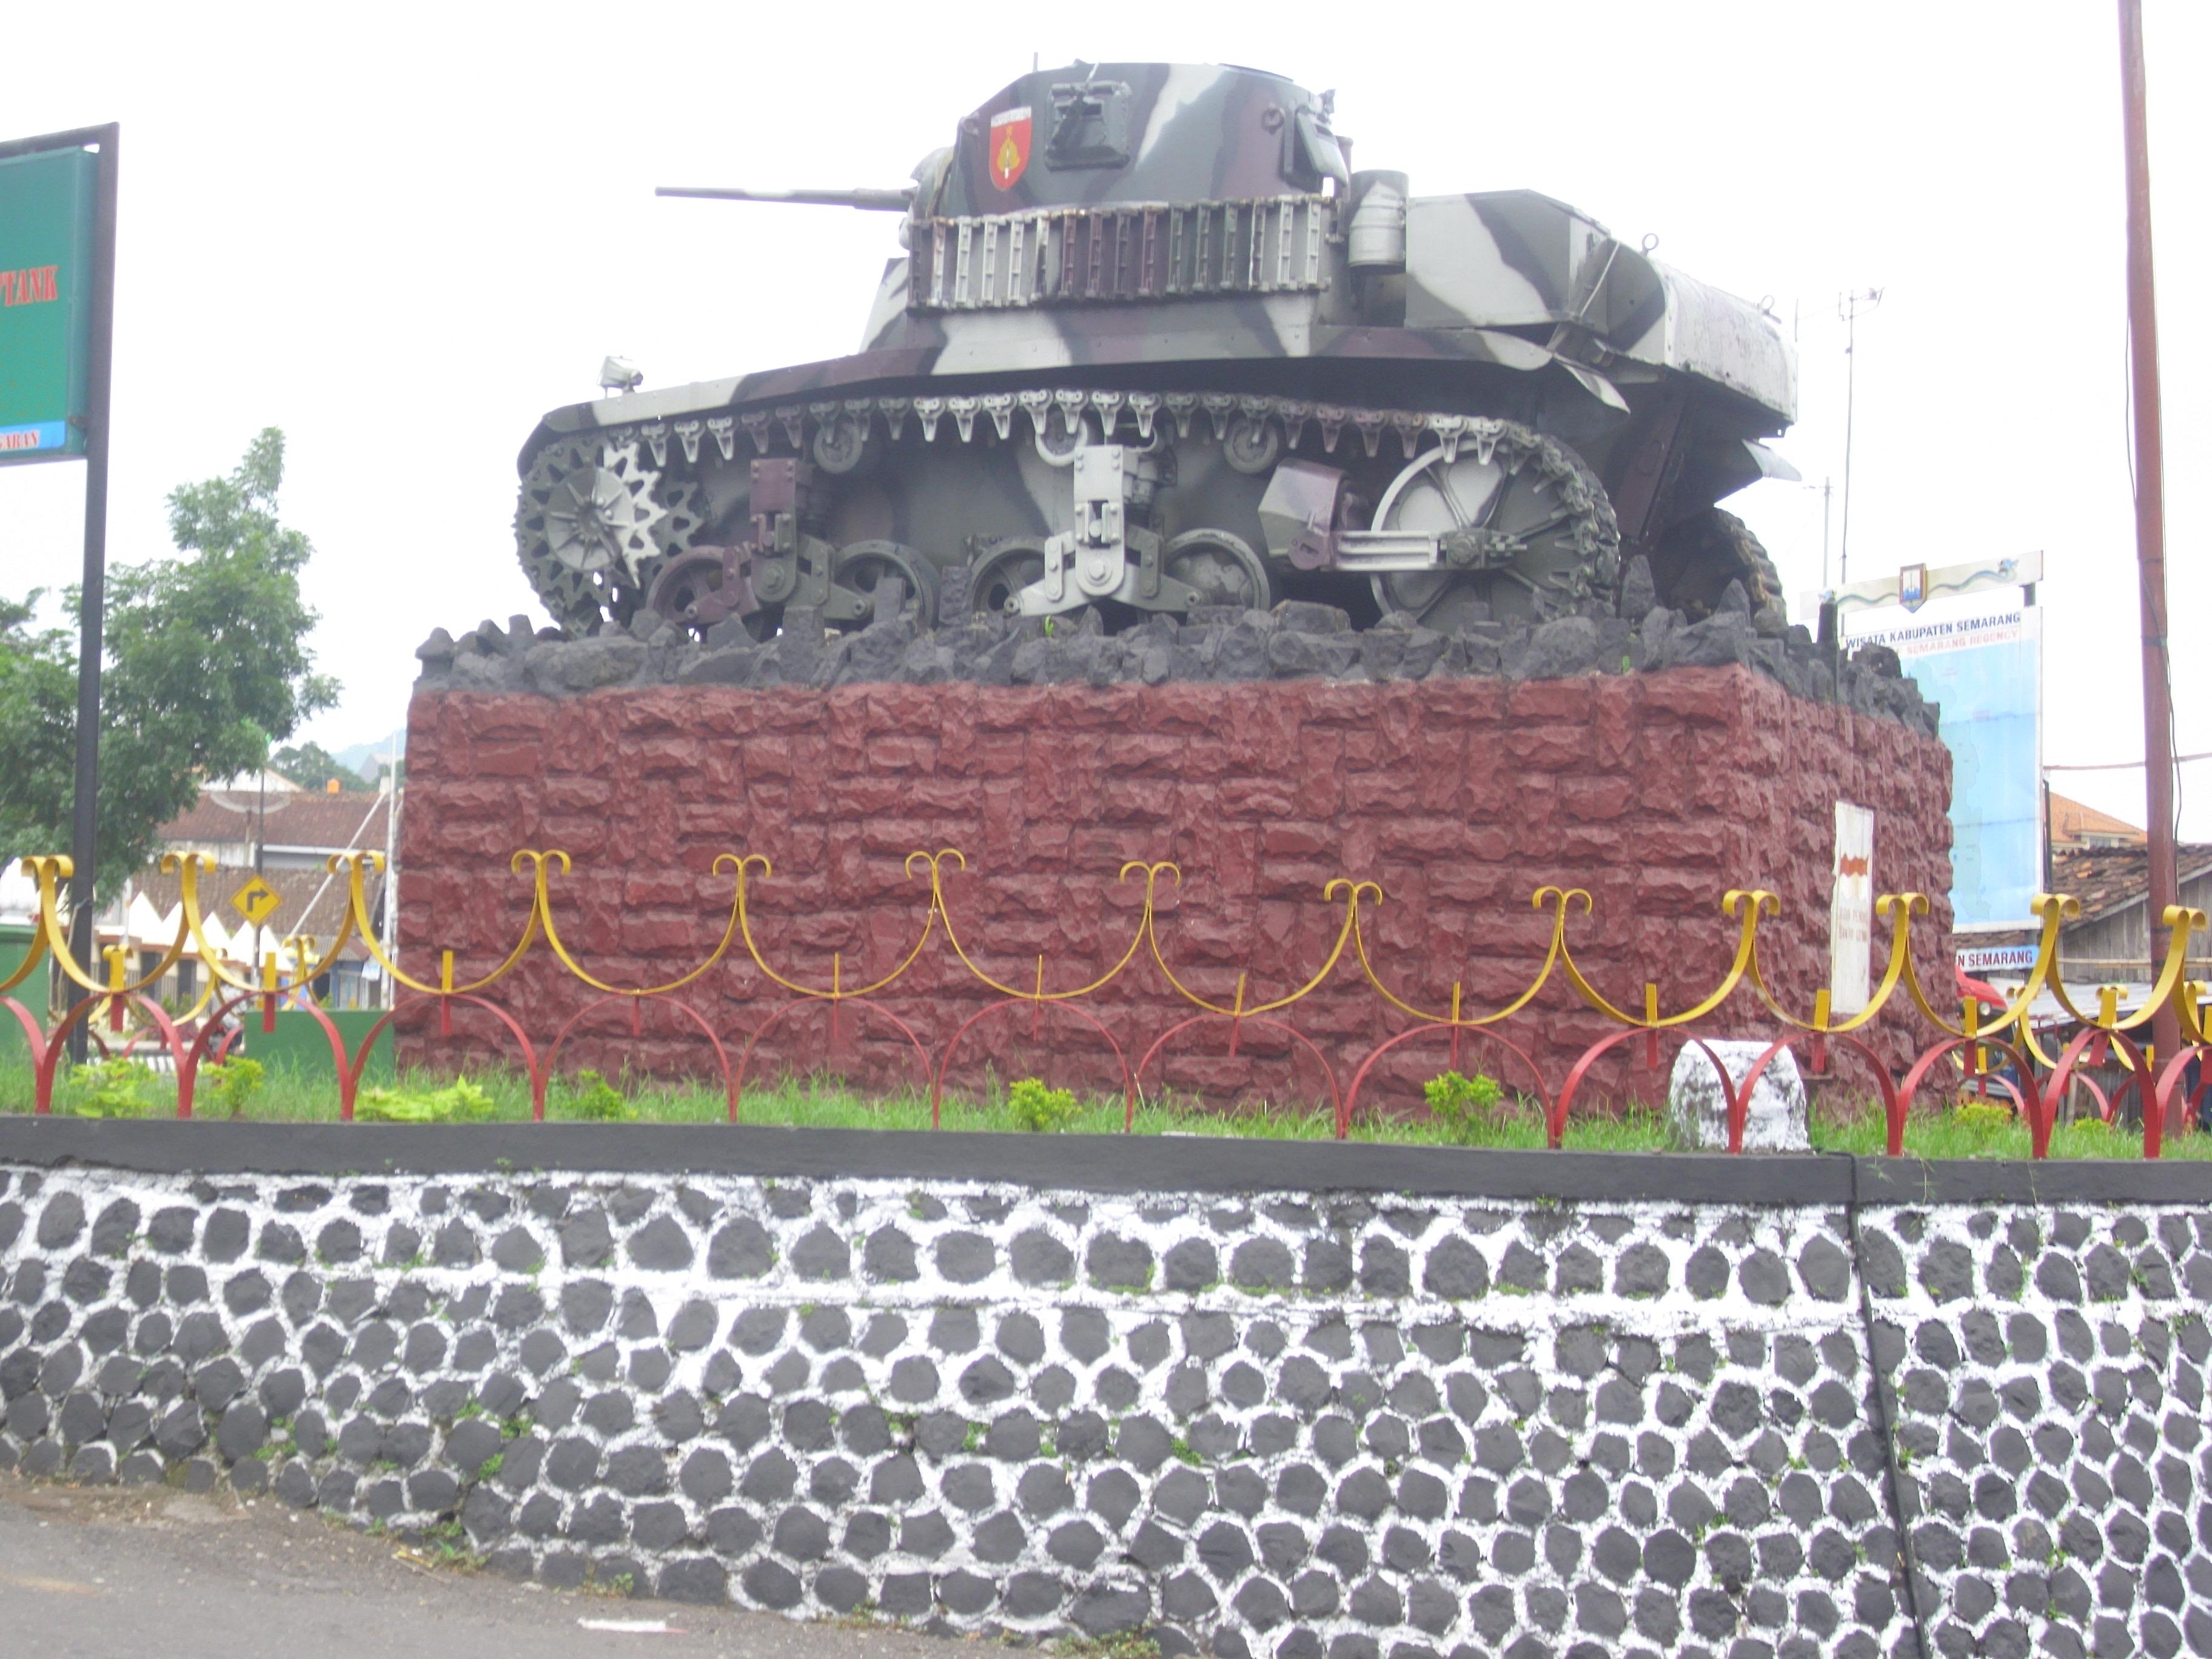 Membuka Penasaran Kota Ambarawa Indah Sagst Tank Pertigaan Monumen Palagan